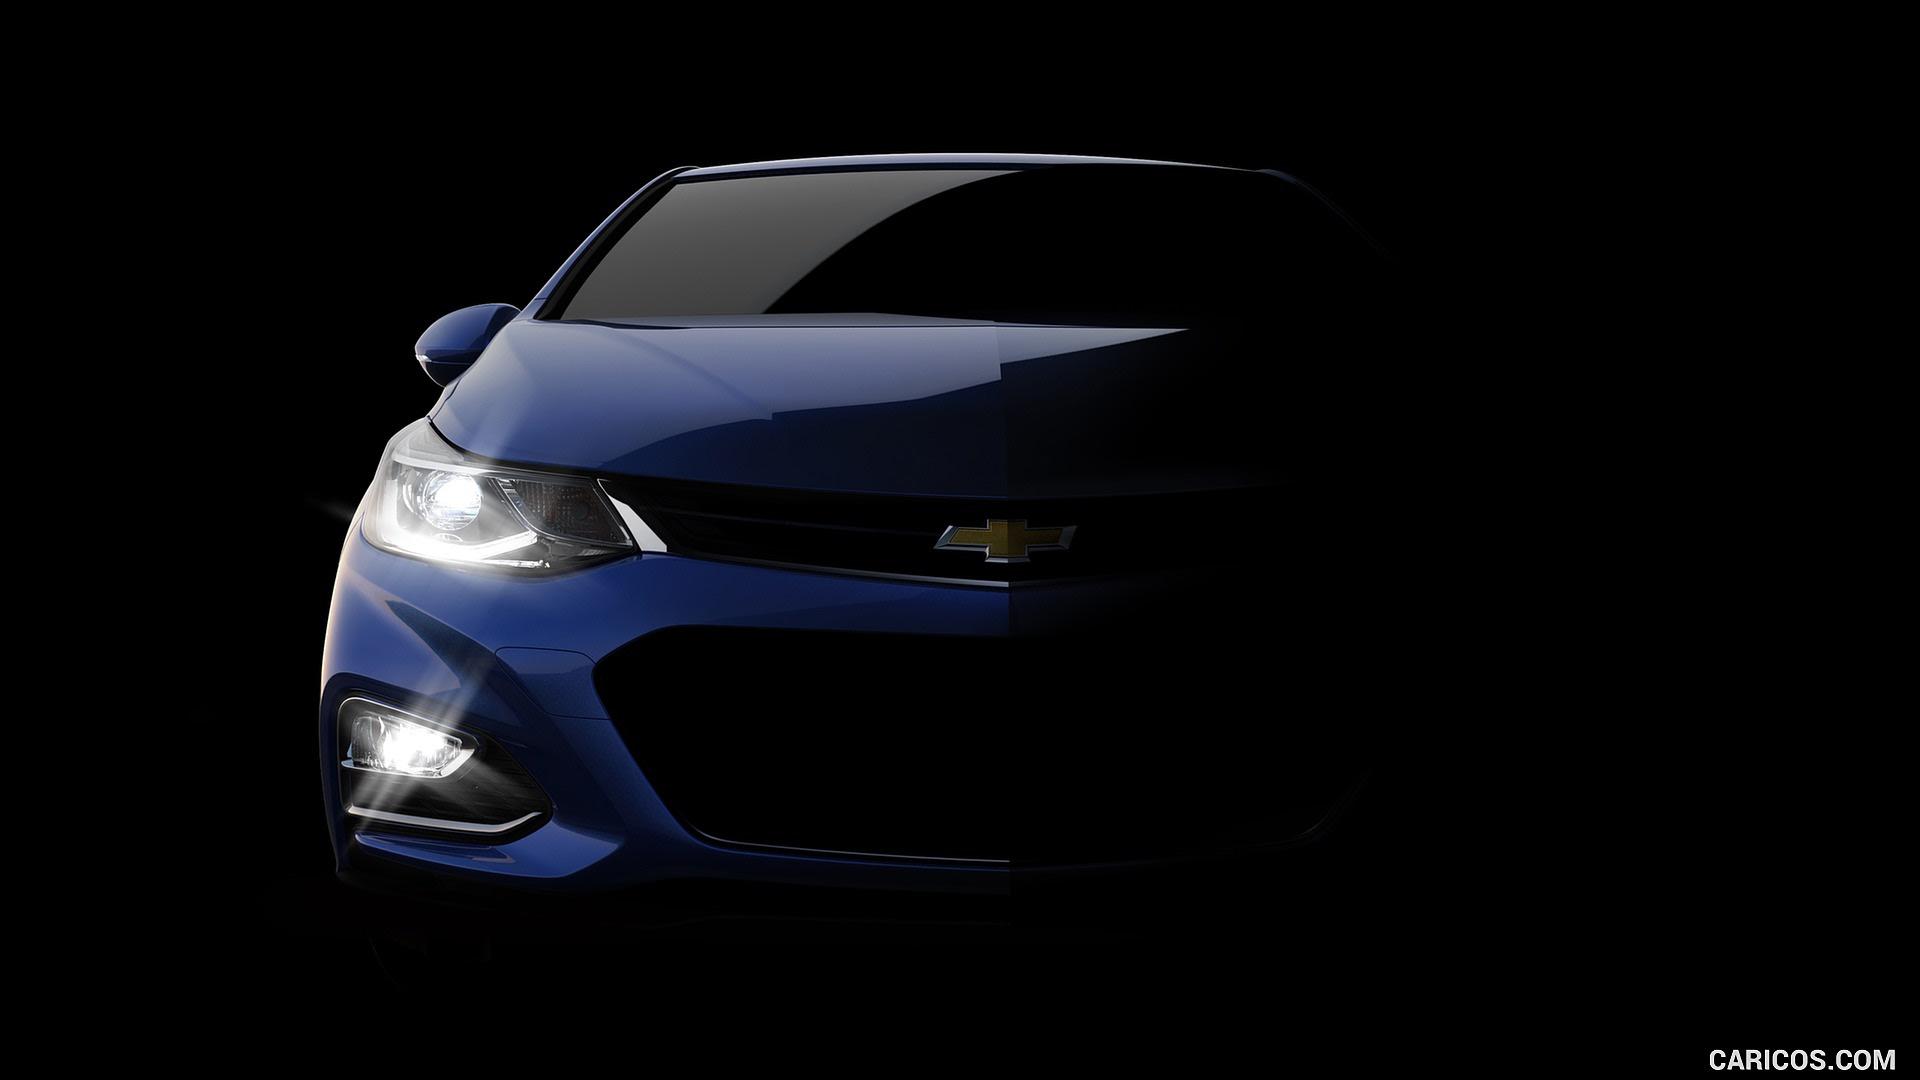 2016 Chevrolet Cruze  Headlight  HD Wallpaper 7